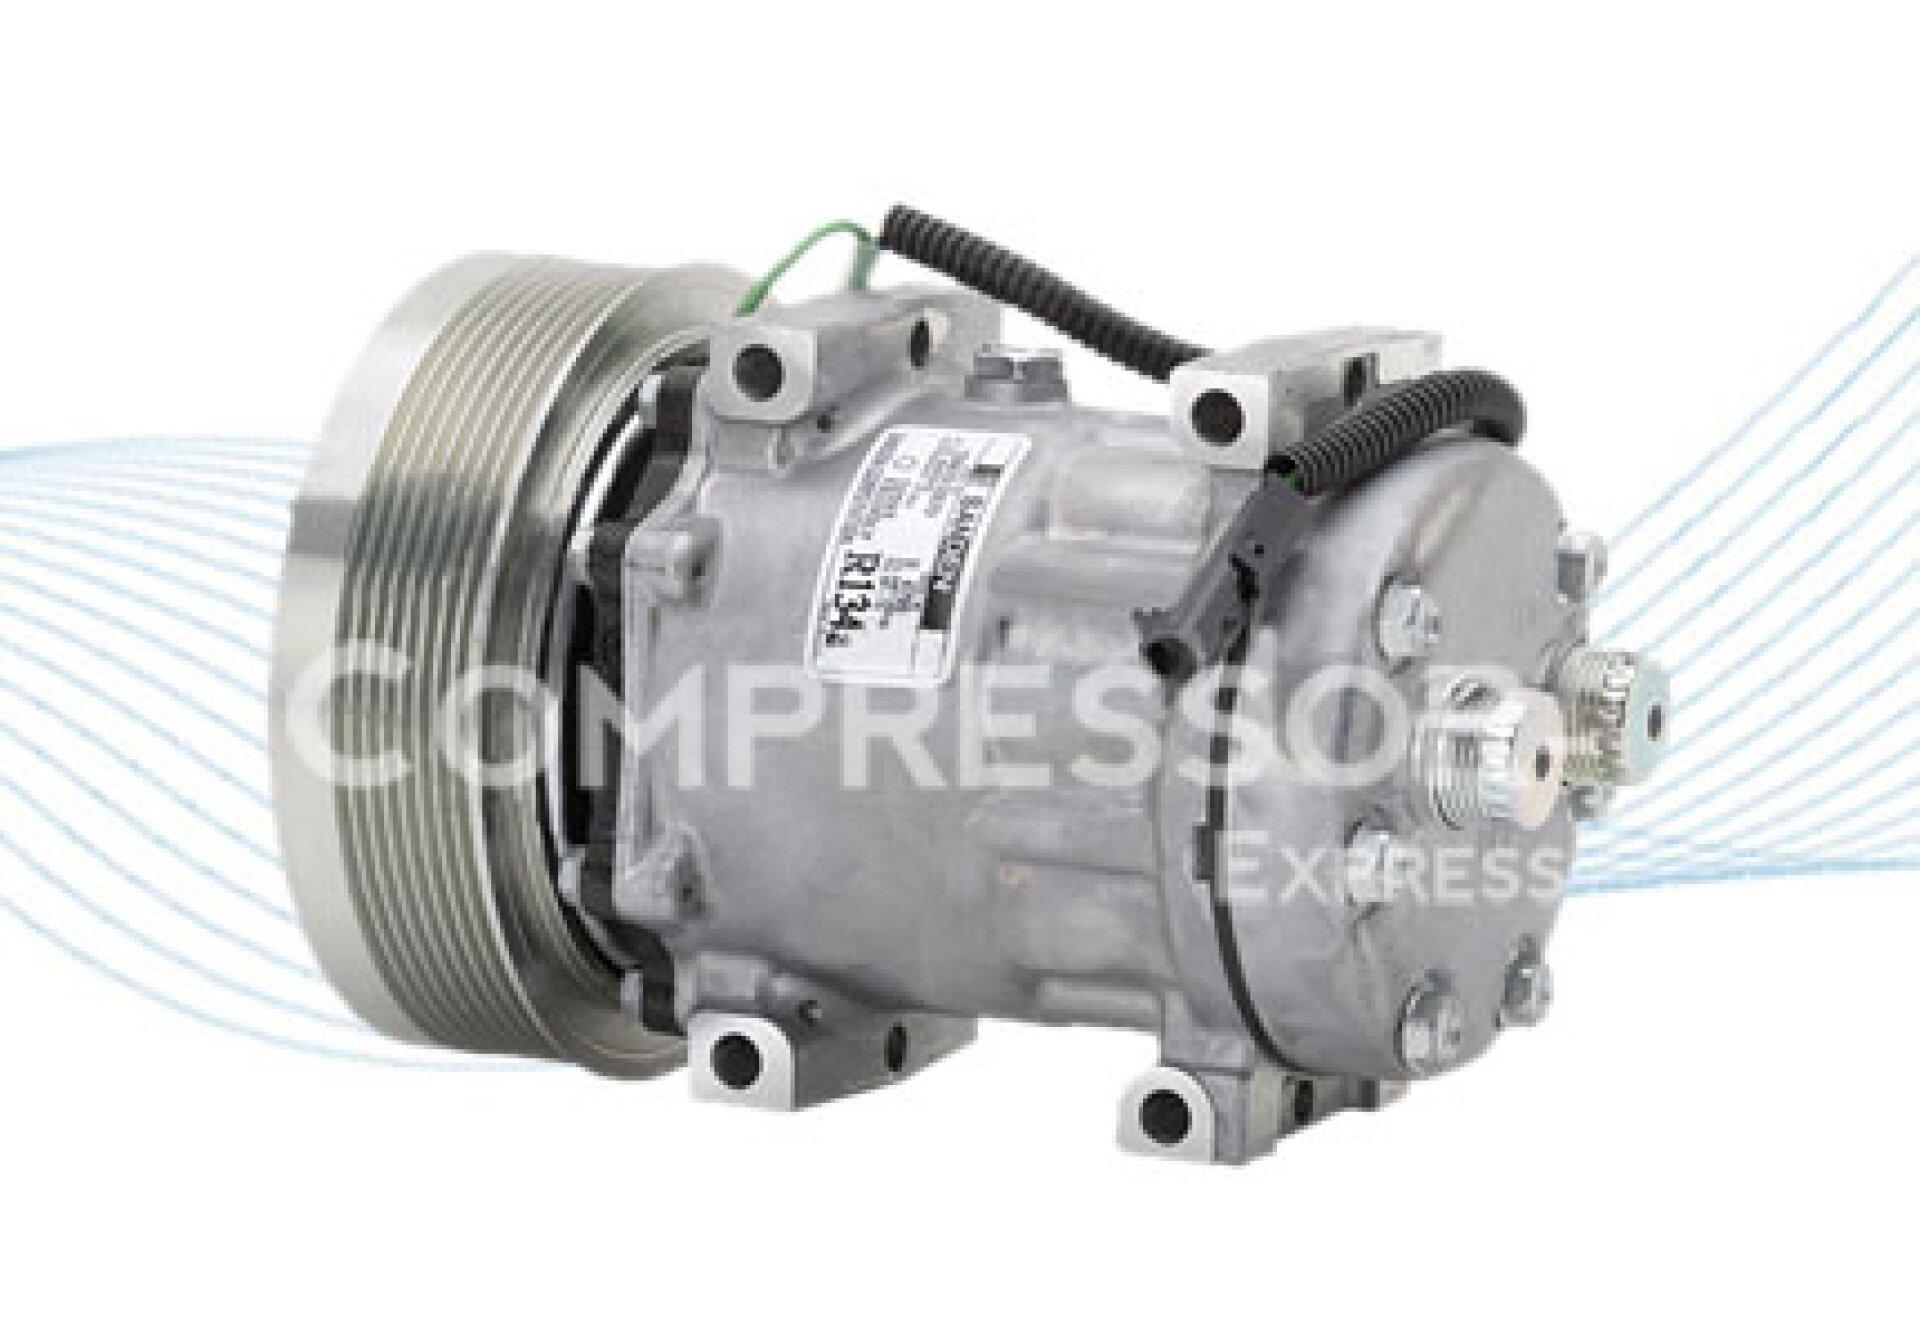 Sanden 7h15 compresor de aire acondicionado 4300 352524a2 for Compresor de aire acondicionado